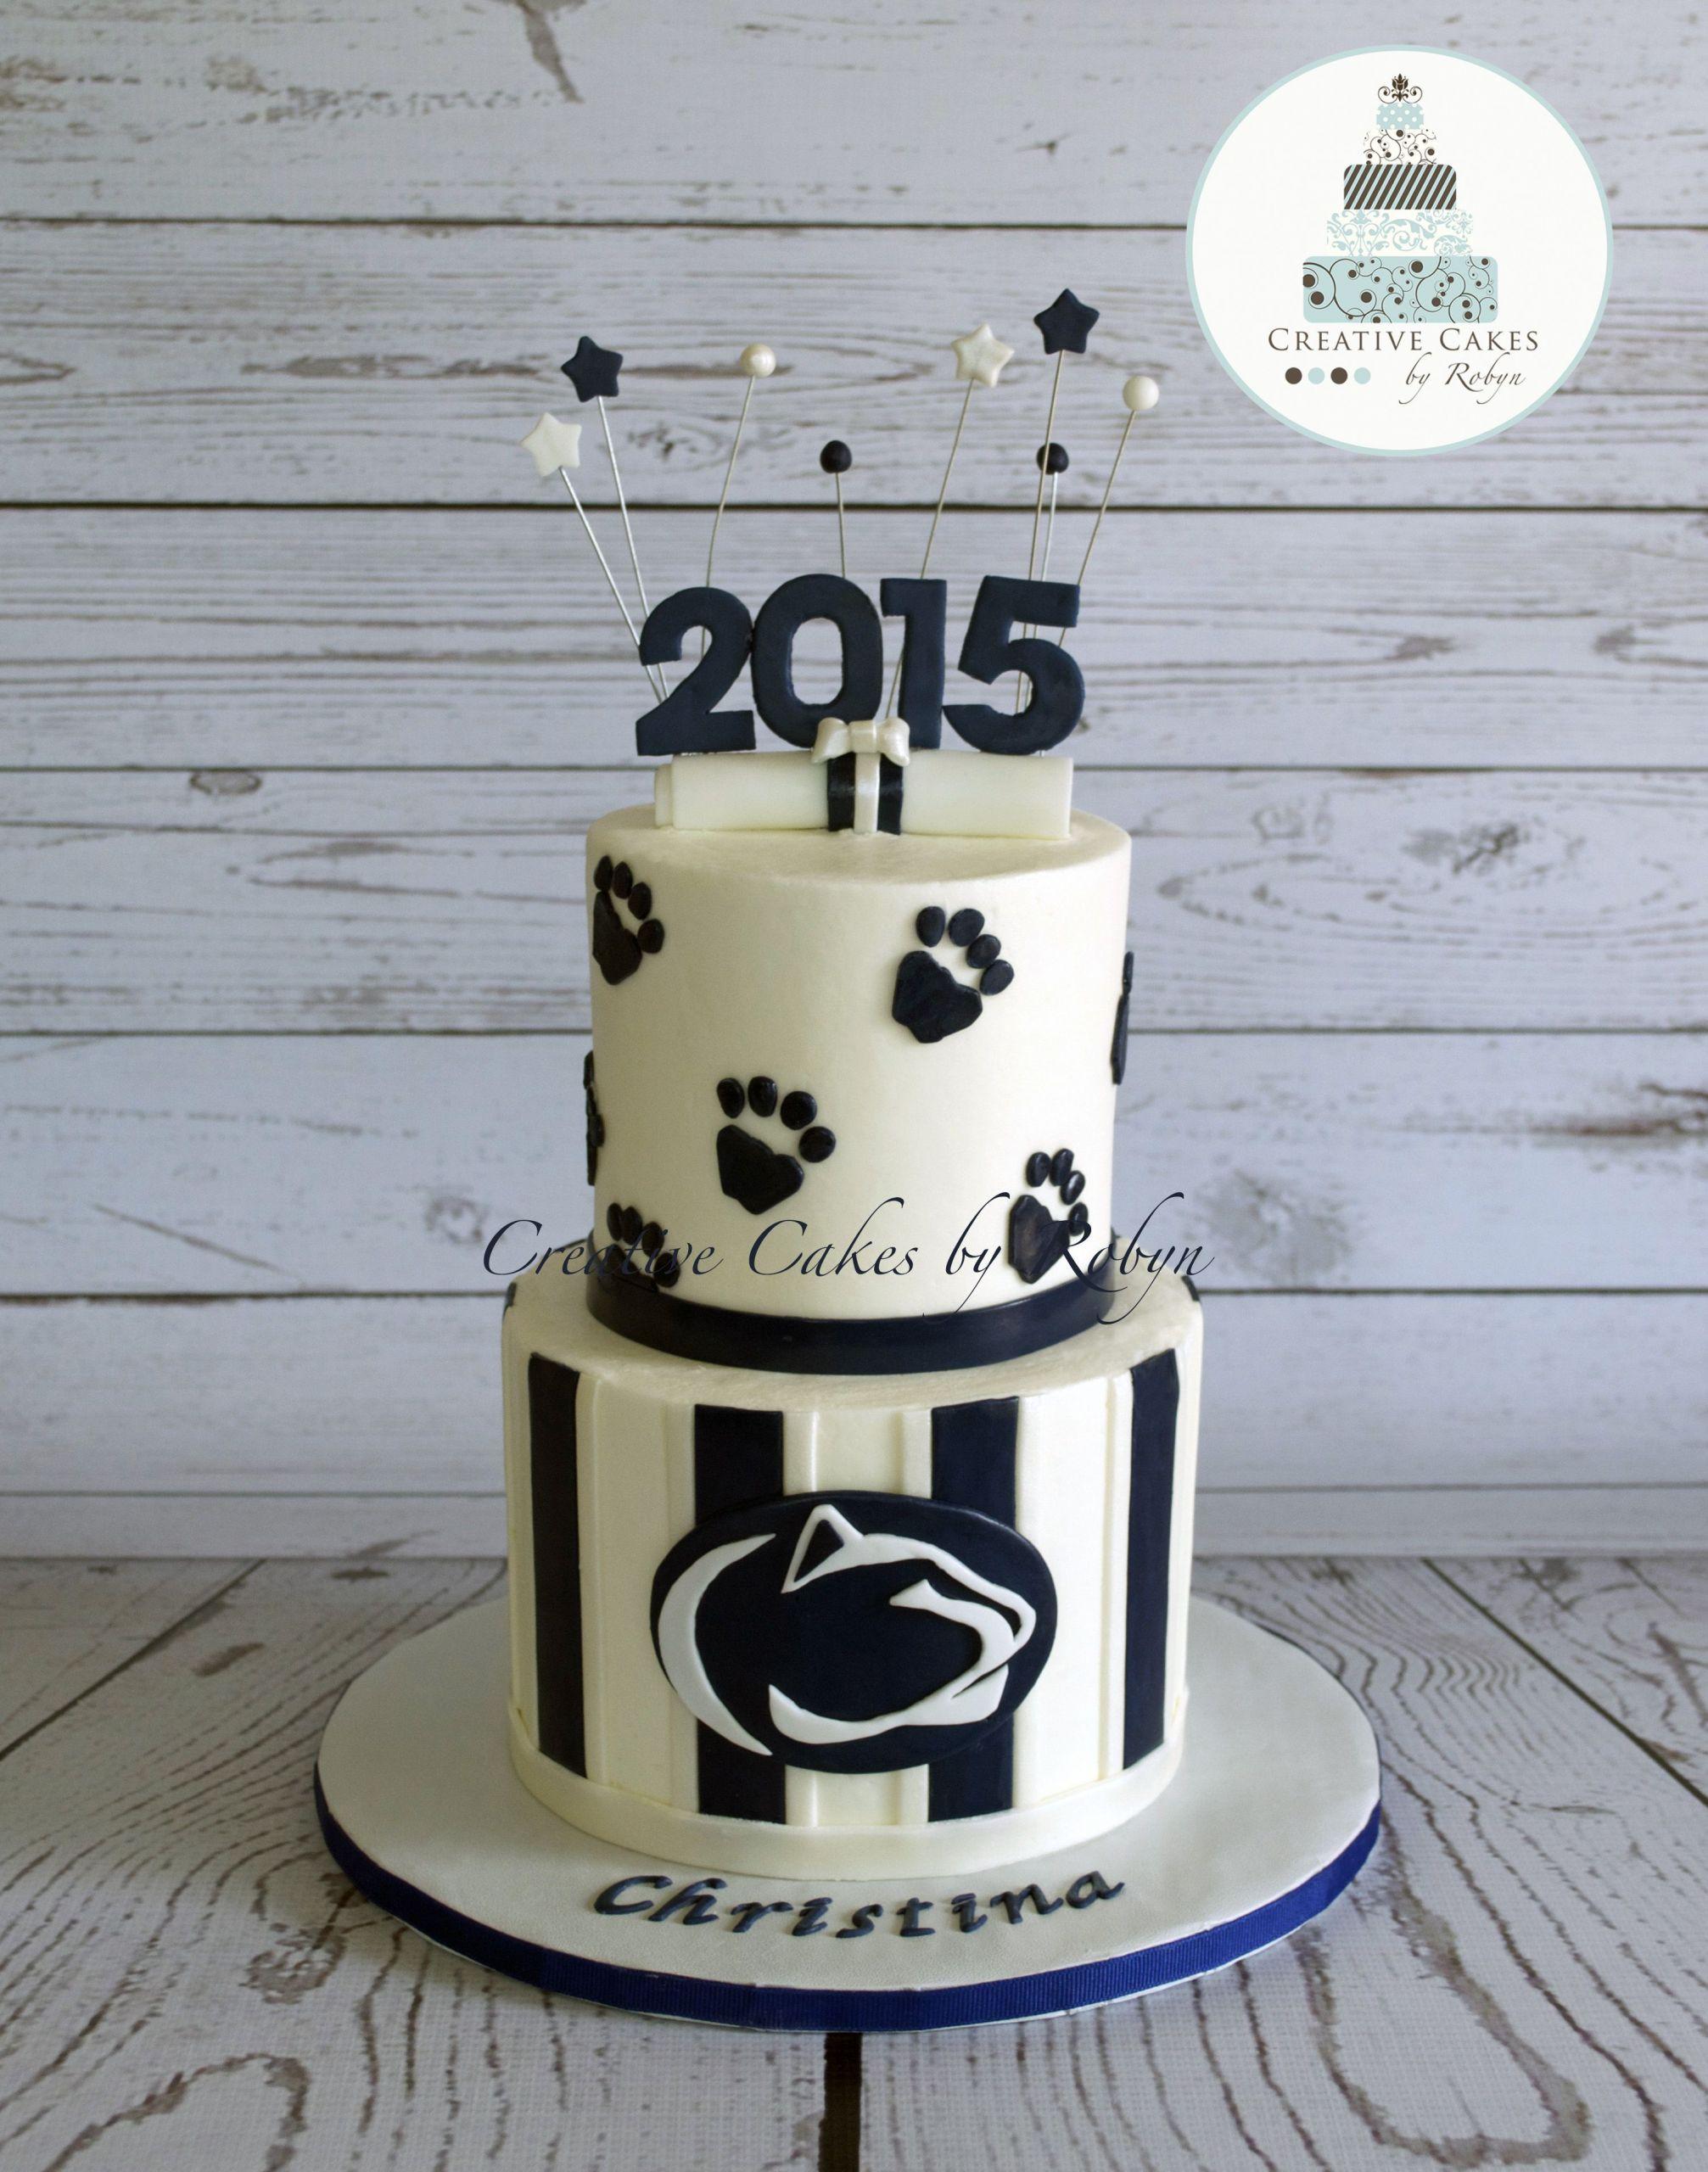 Penn State Graduation Gift Ideas  Penn State graduation cake